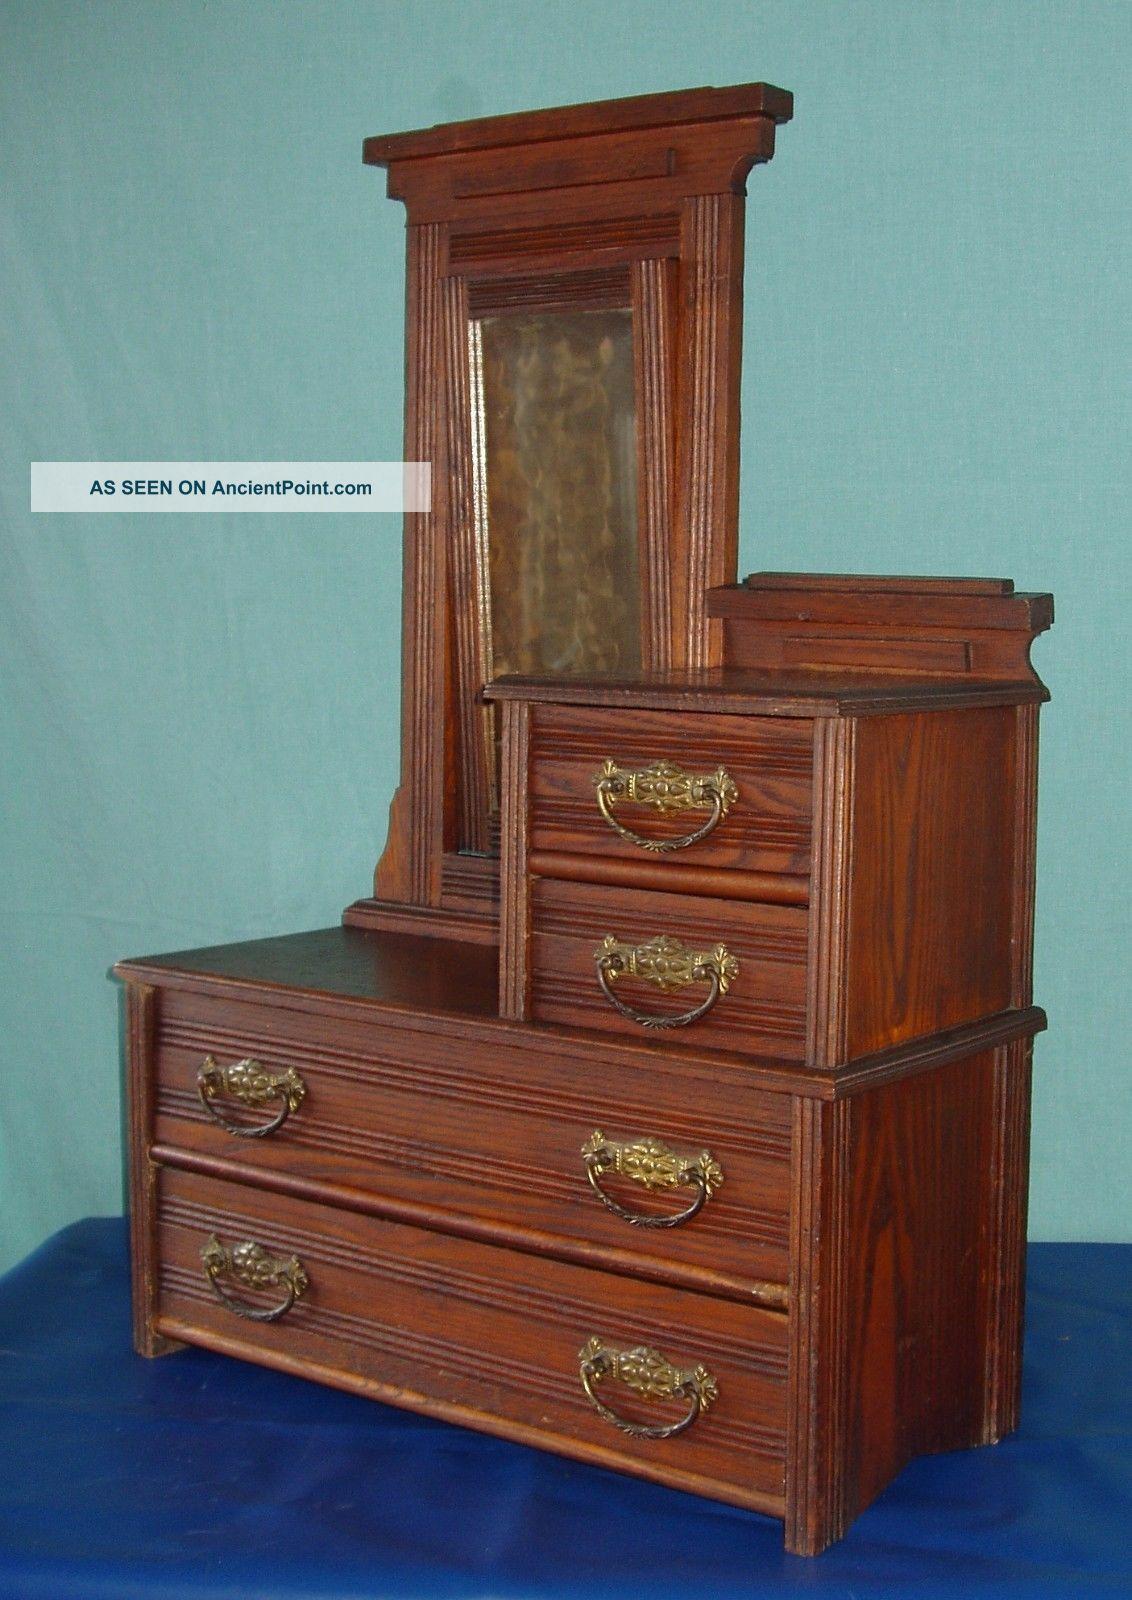 Antique Salesman Sample Dresser Chest Of Drawers 1800-1899 photo